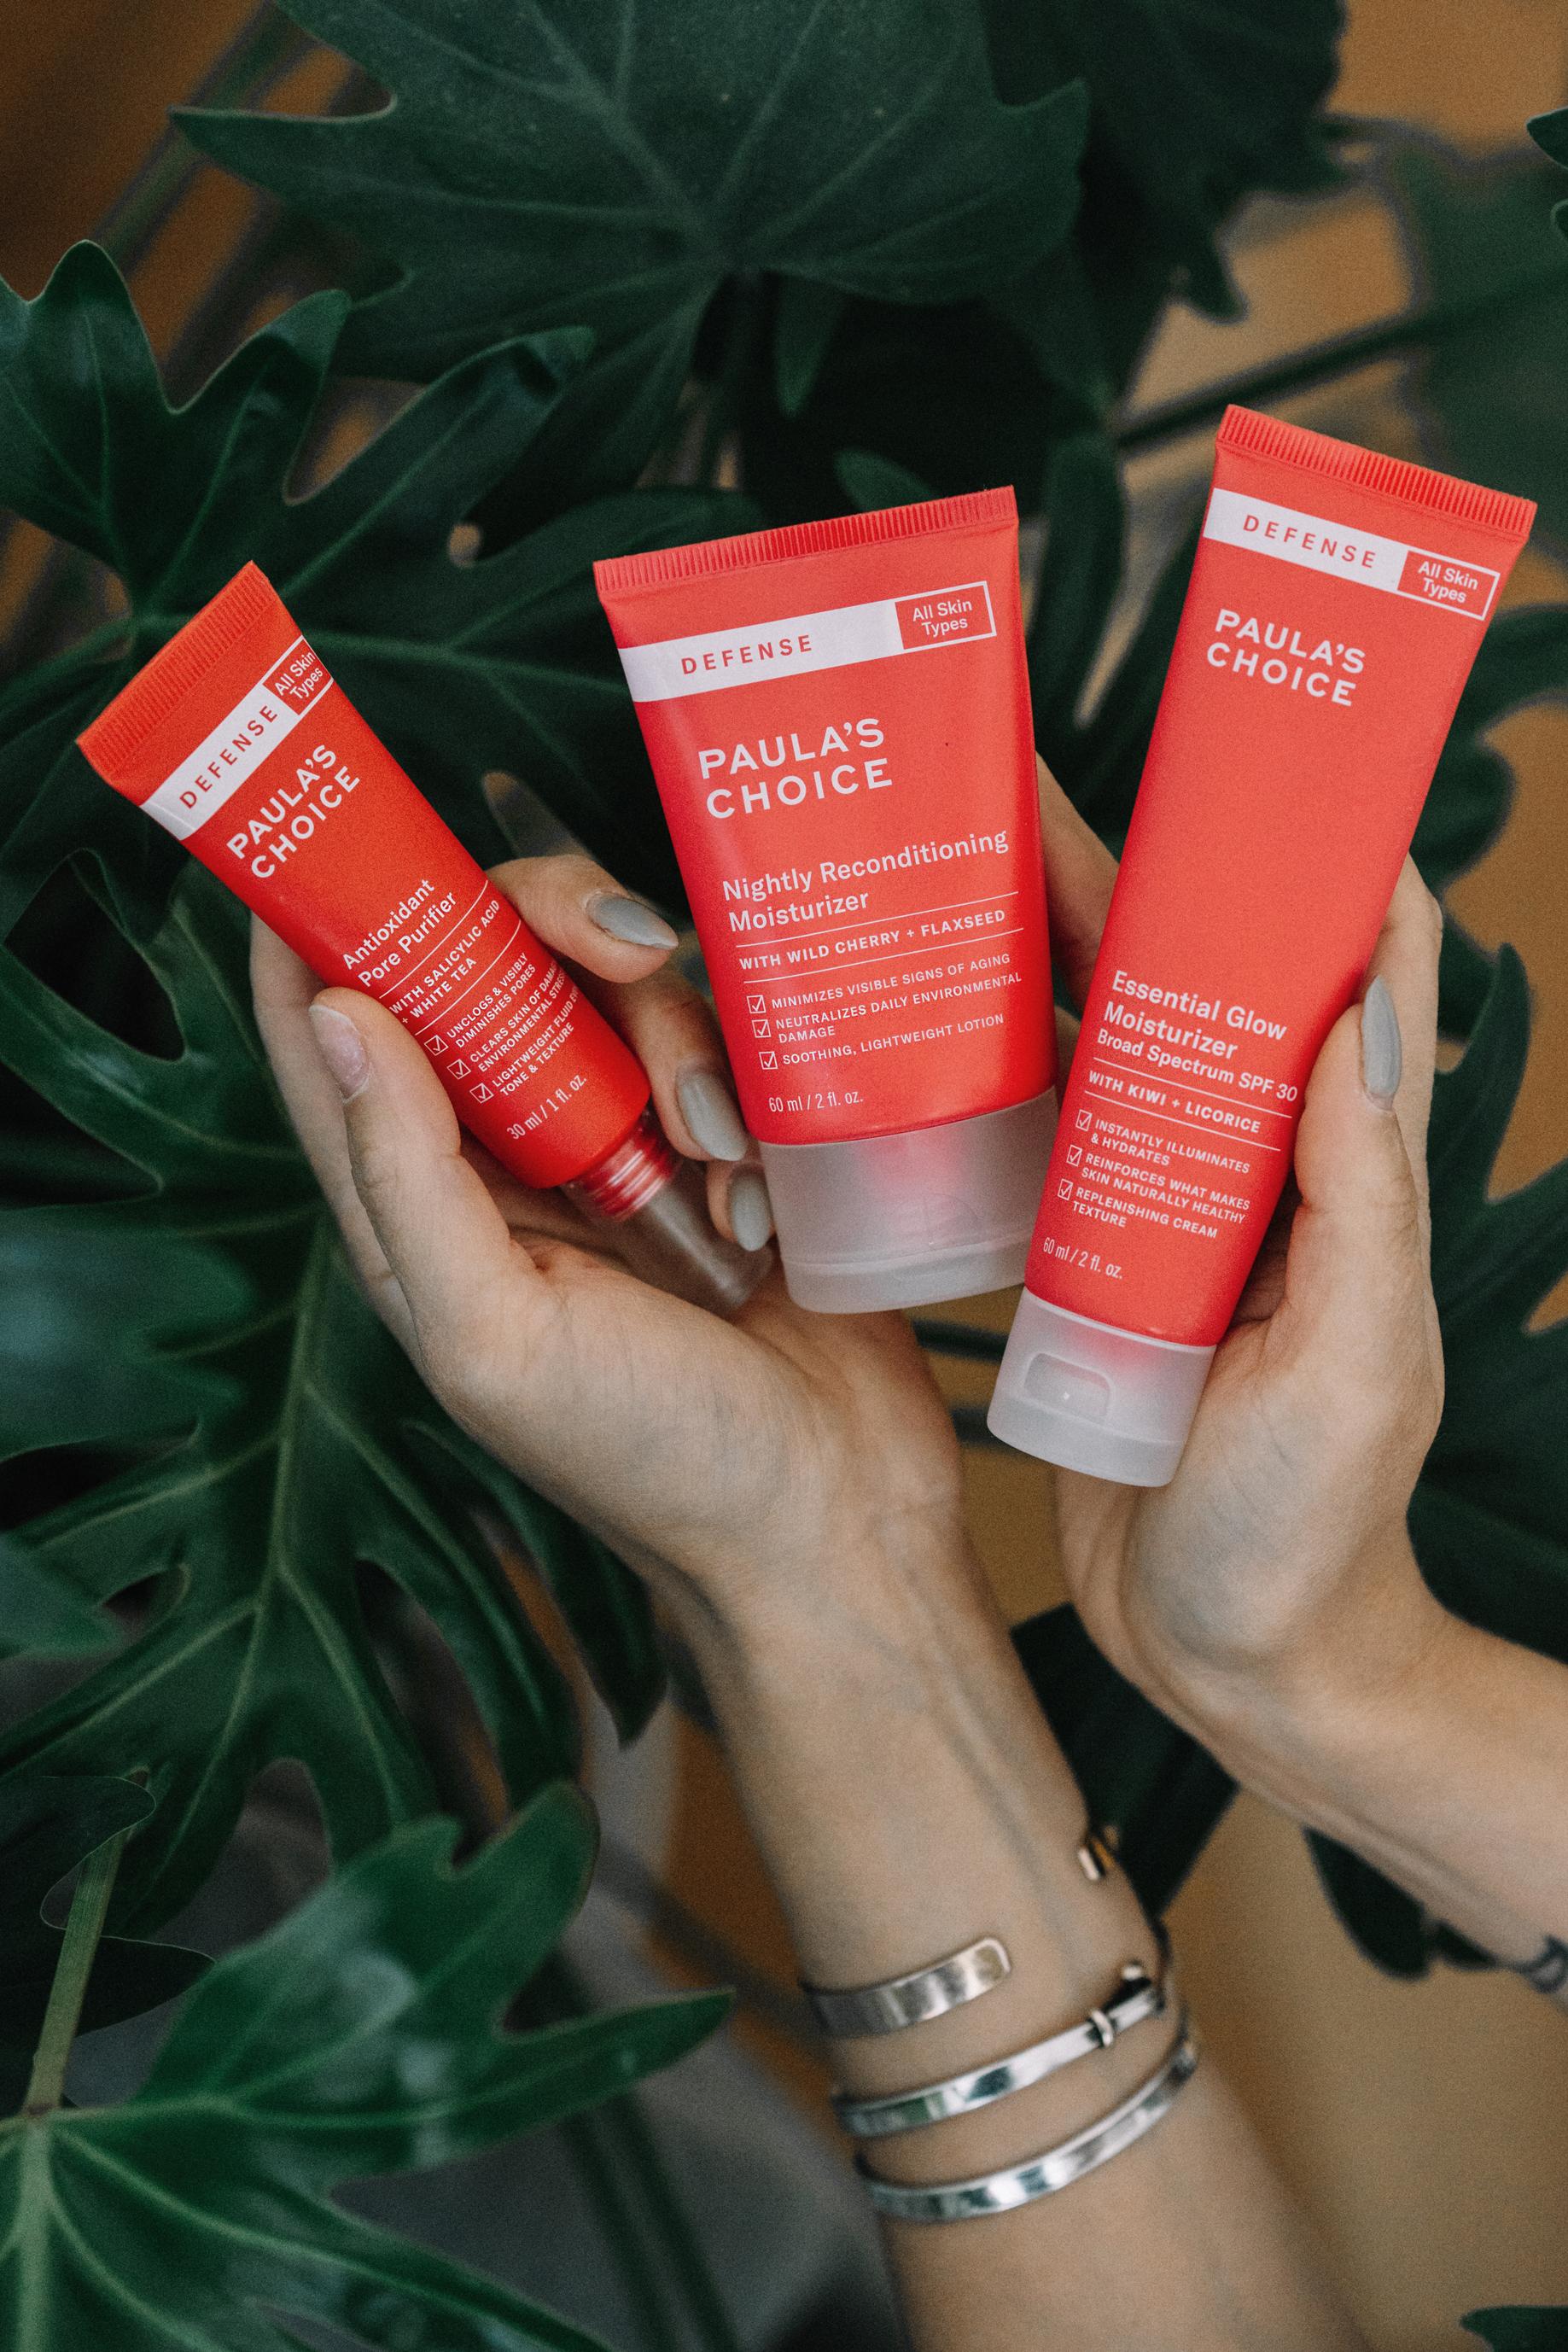 Paulas Choice   Defense   Hautpflege